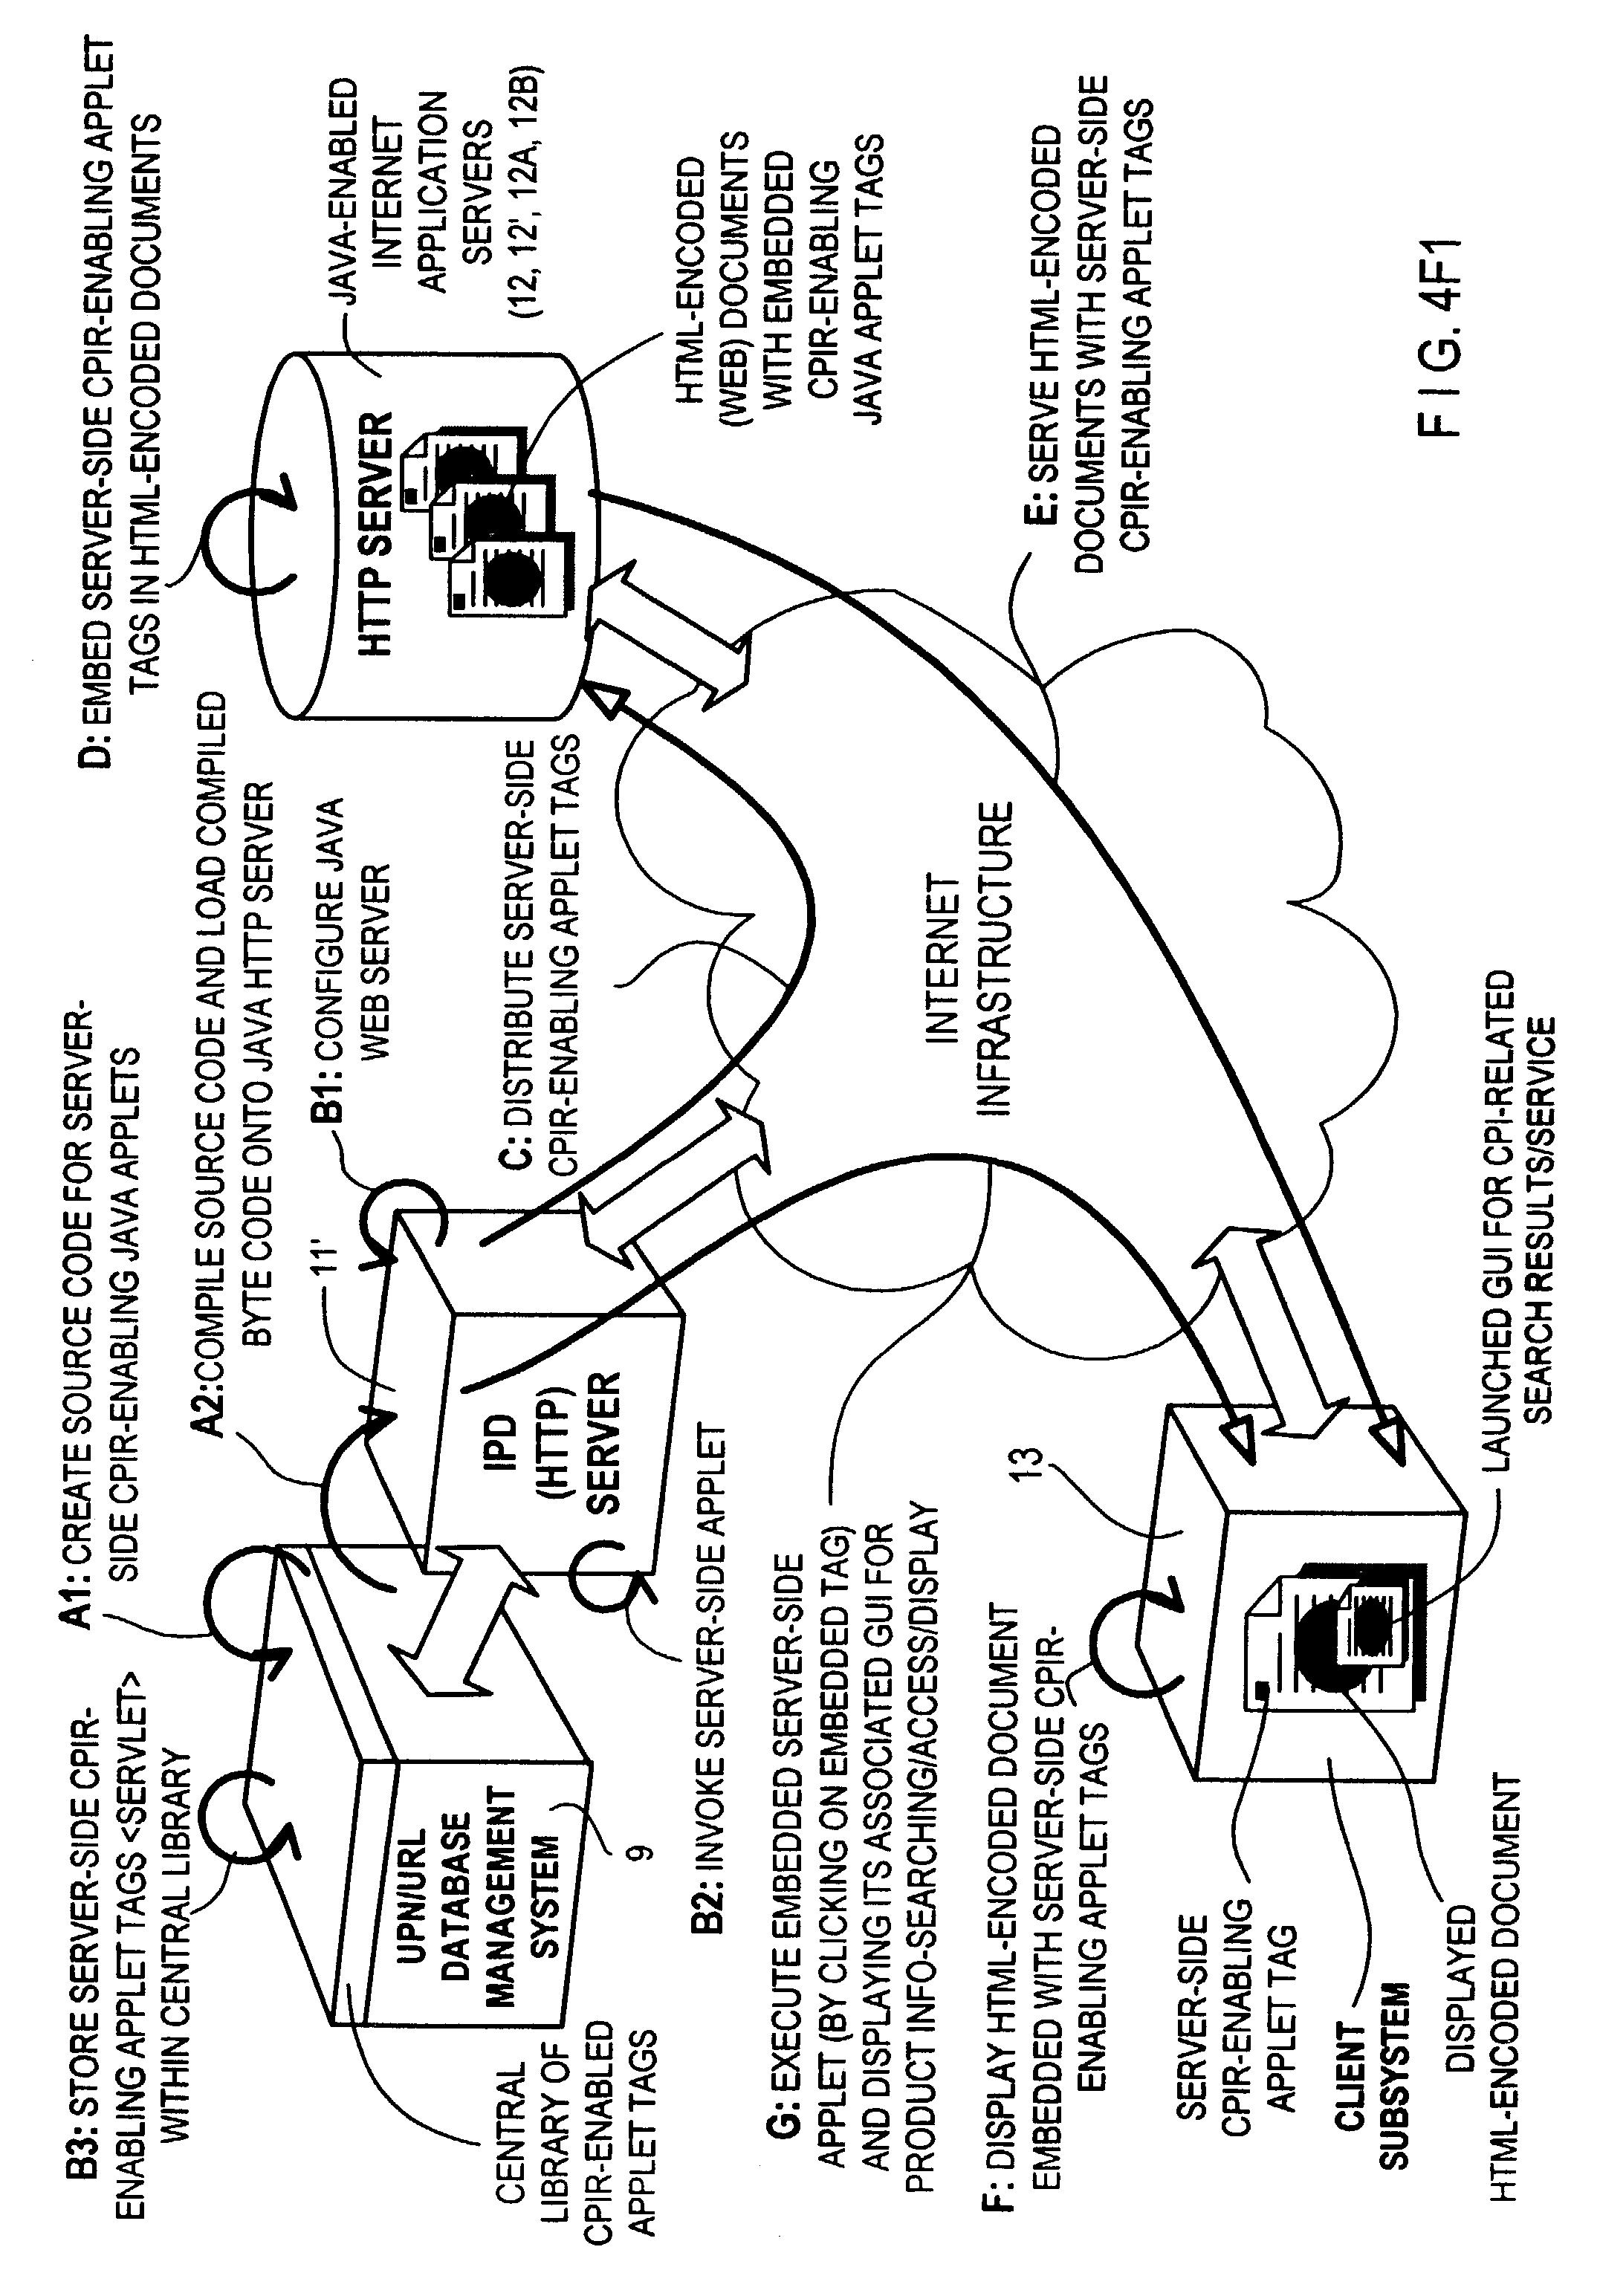 Patent US 7,516,094 B2